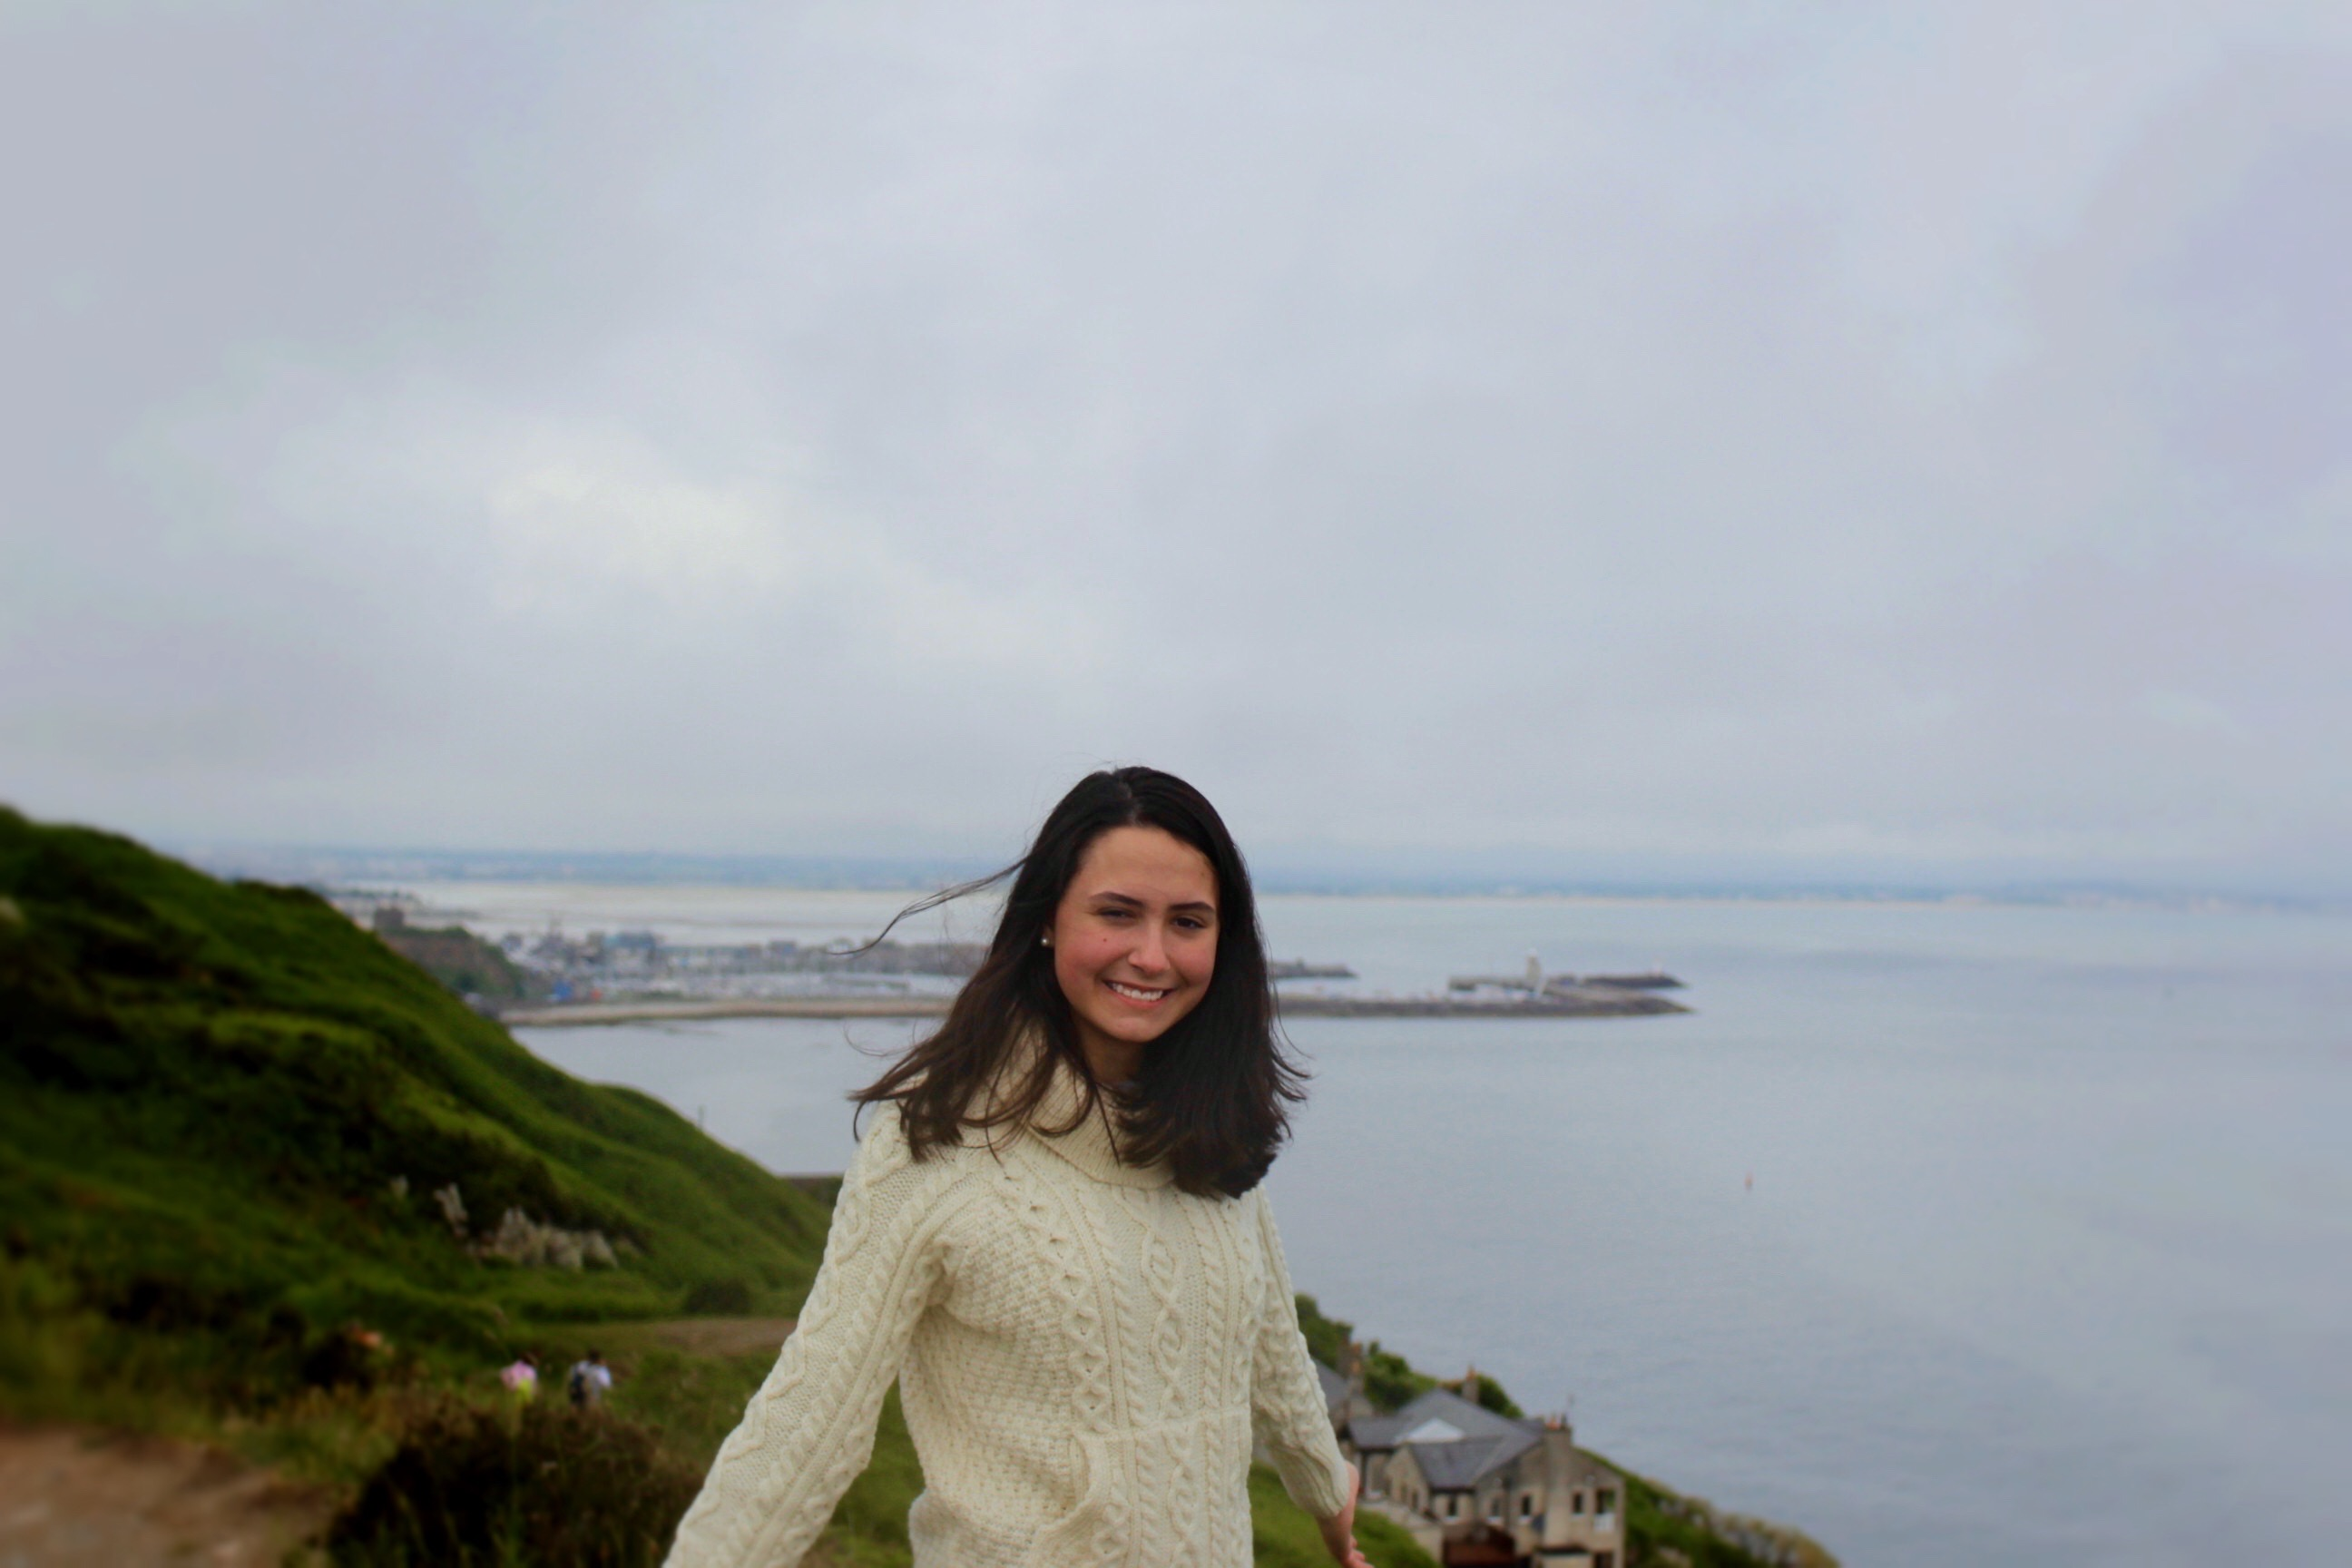 Forum on this topic: Laura Harrier, toni-garrn-ger-4-2011-013-2018/